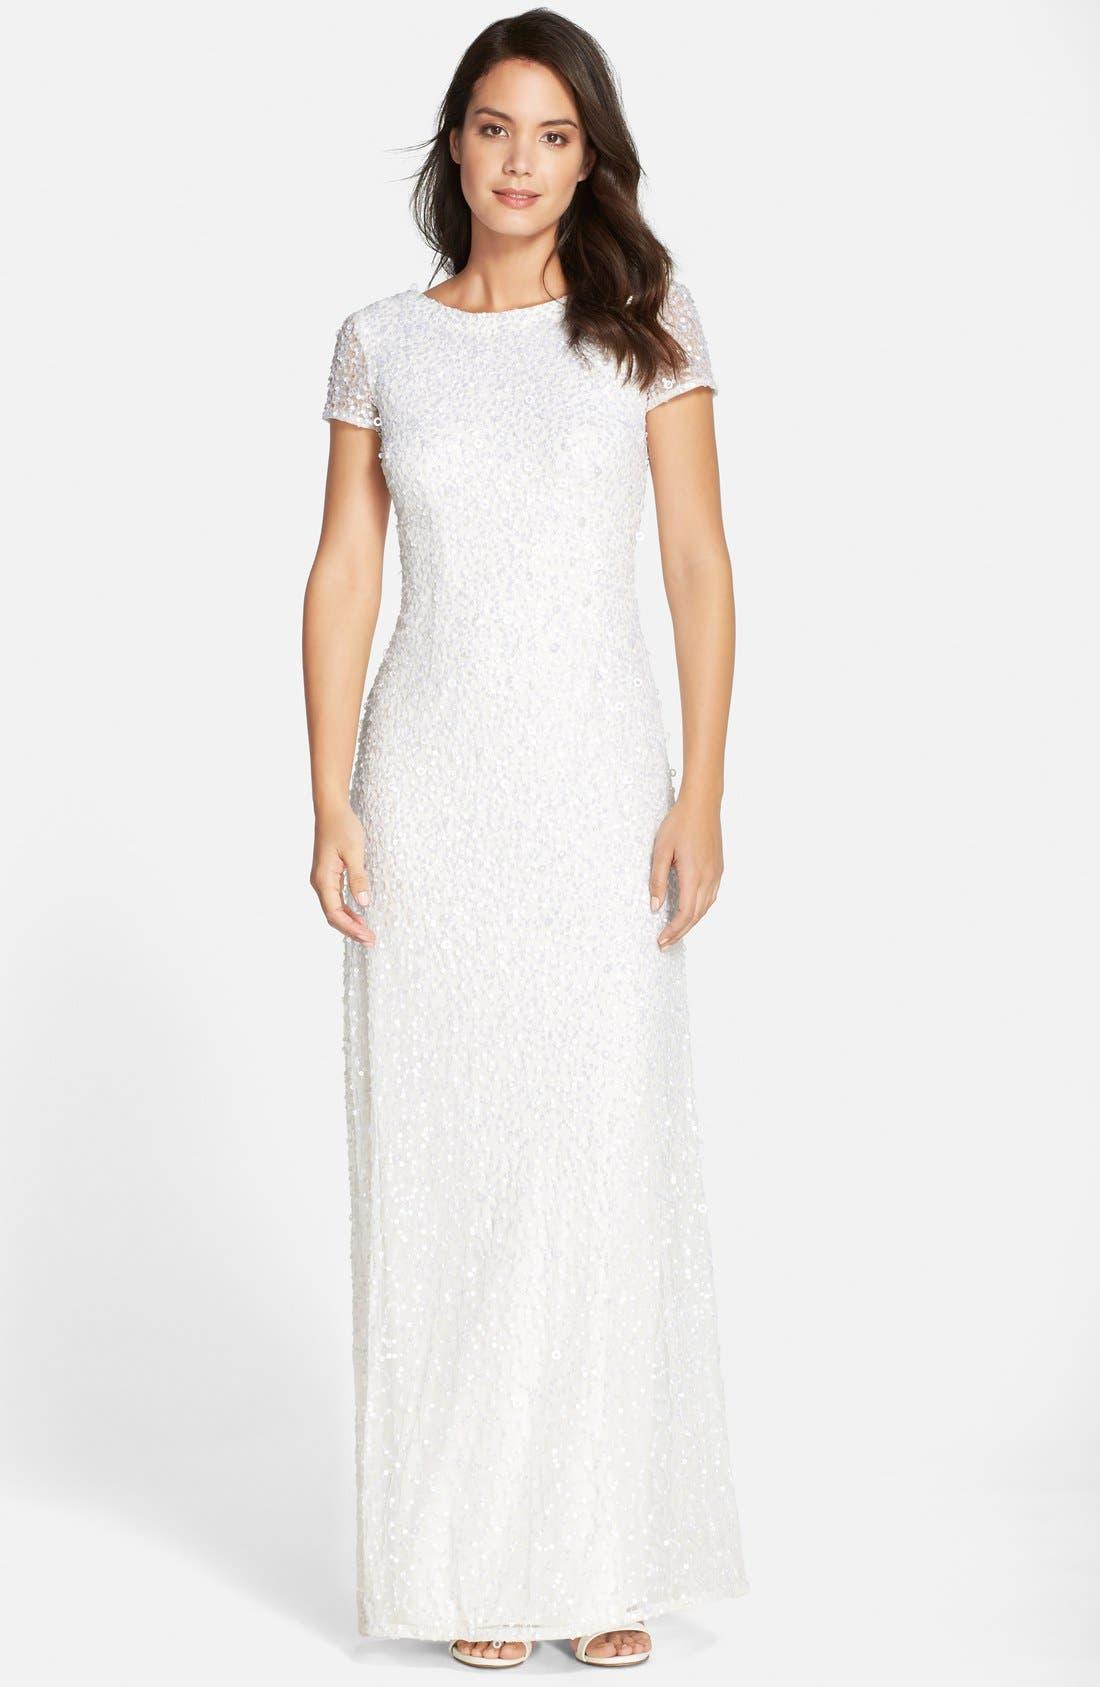 Alternate Image 1 Selected - Adrianna Papell Short Sleeve Sequin Mesh Gown (Regular & Petite)